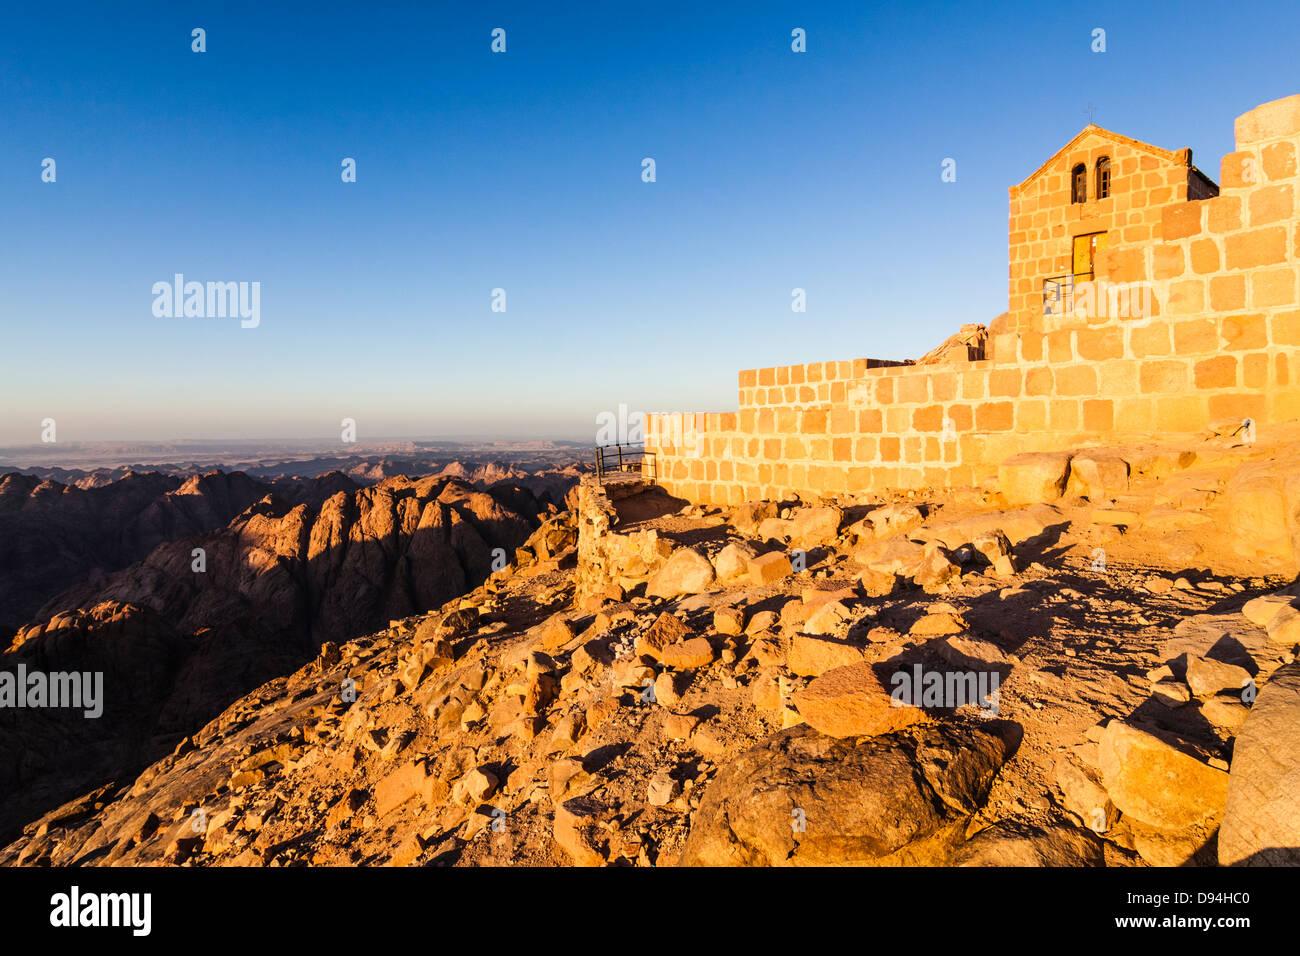 Mount Sinai church horizon sunset landscape - Stock Image